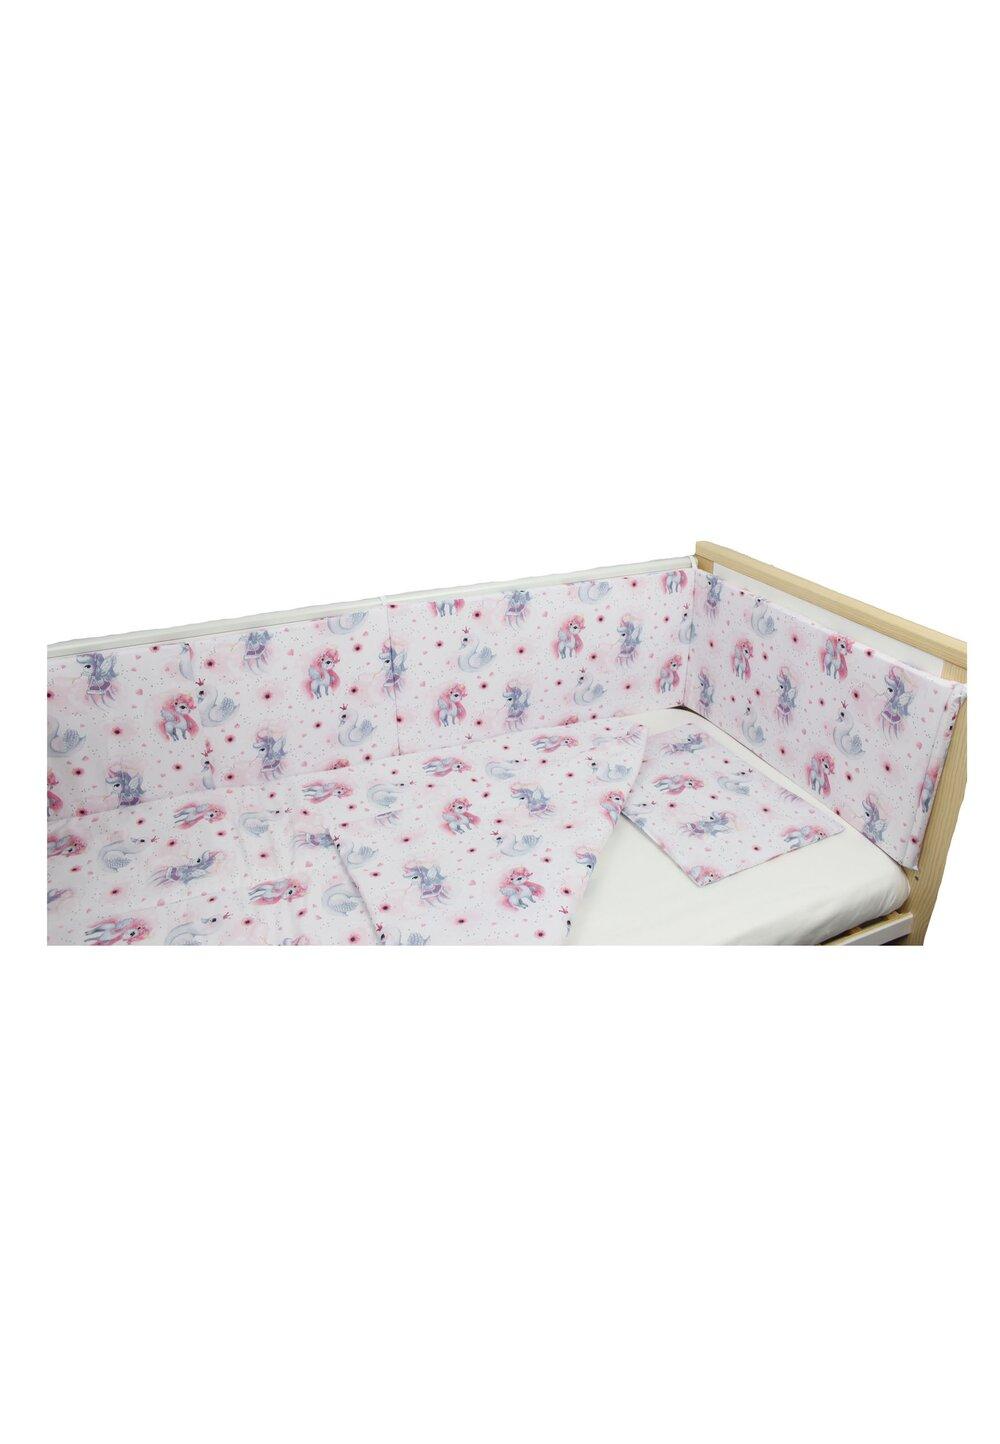 Lenjerie 4 piese, Unicornul roz, 120x60cm imagine